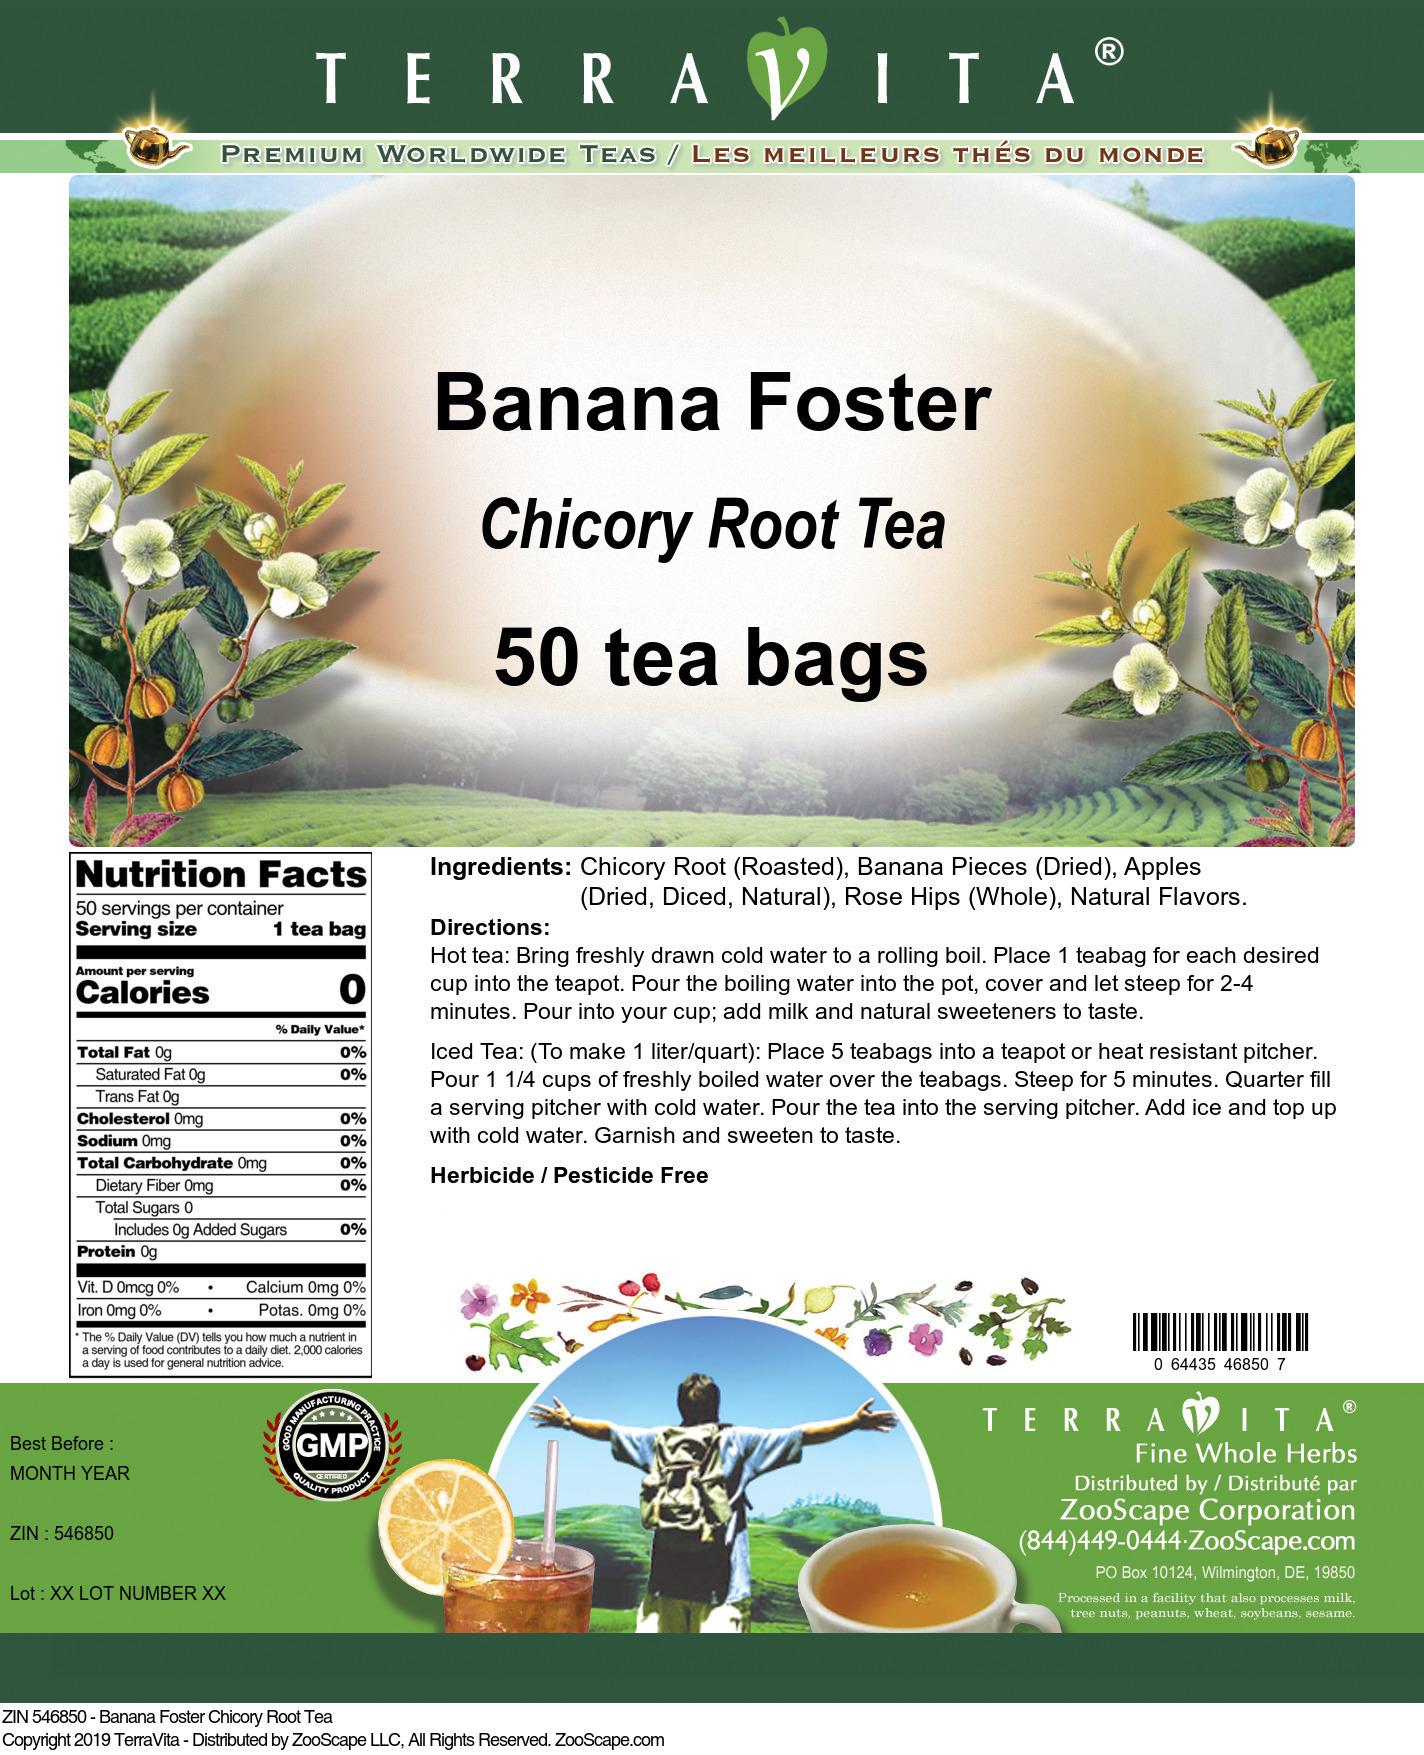 Banana Foster Chicory Root Tea